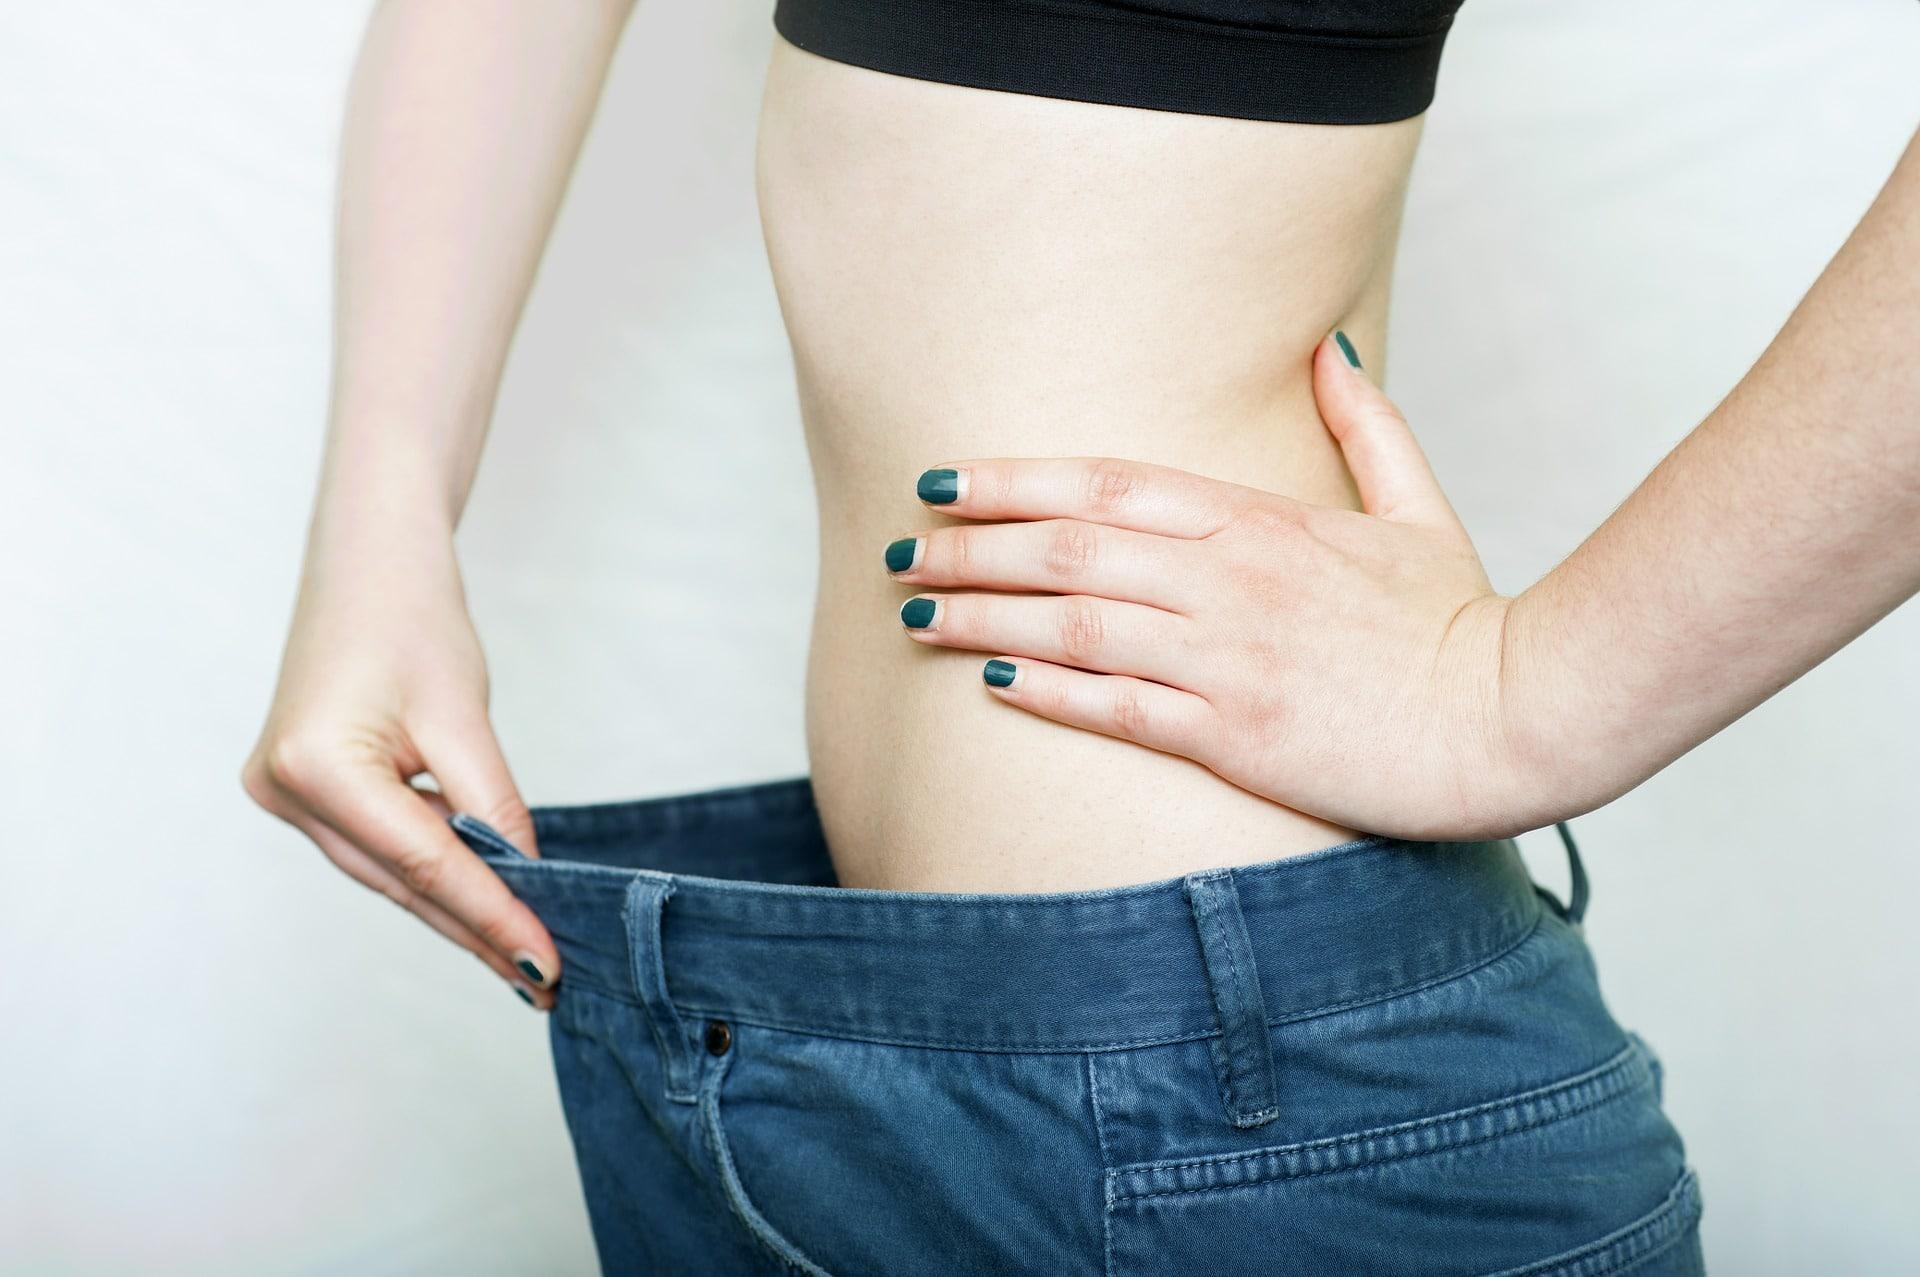 Healthy ways of losing weight